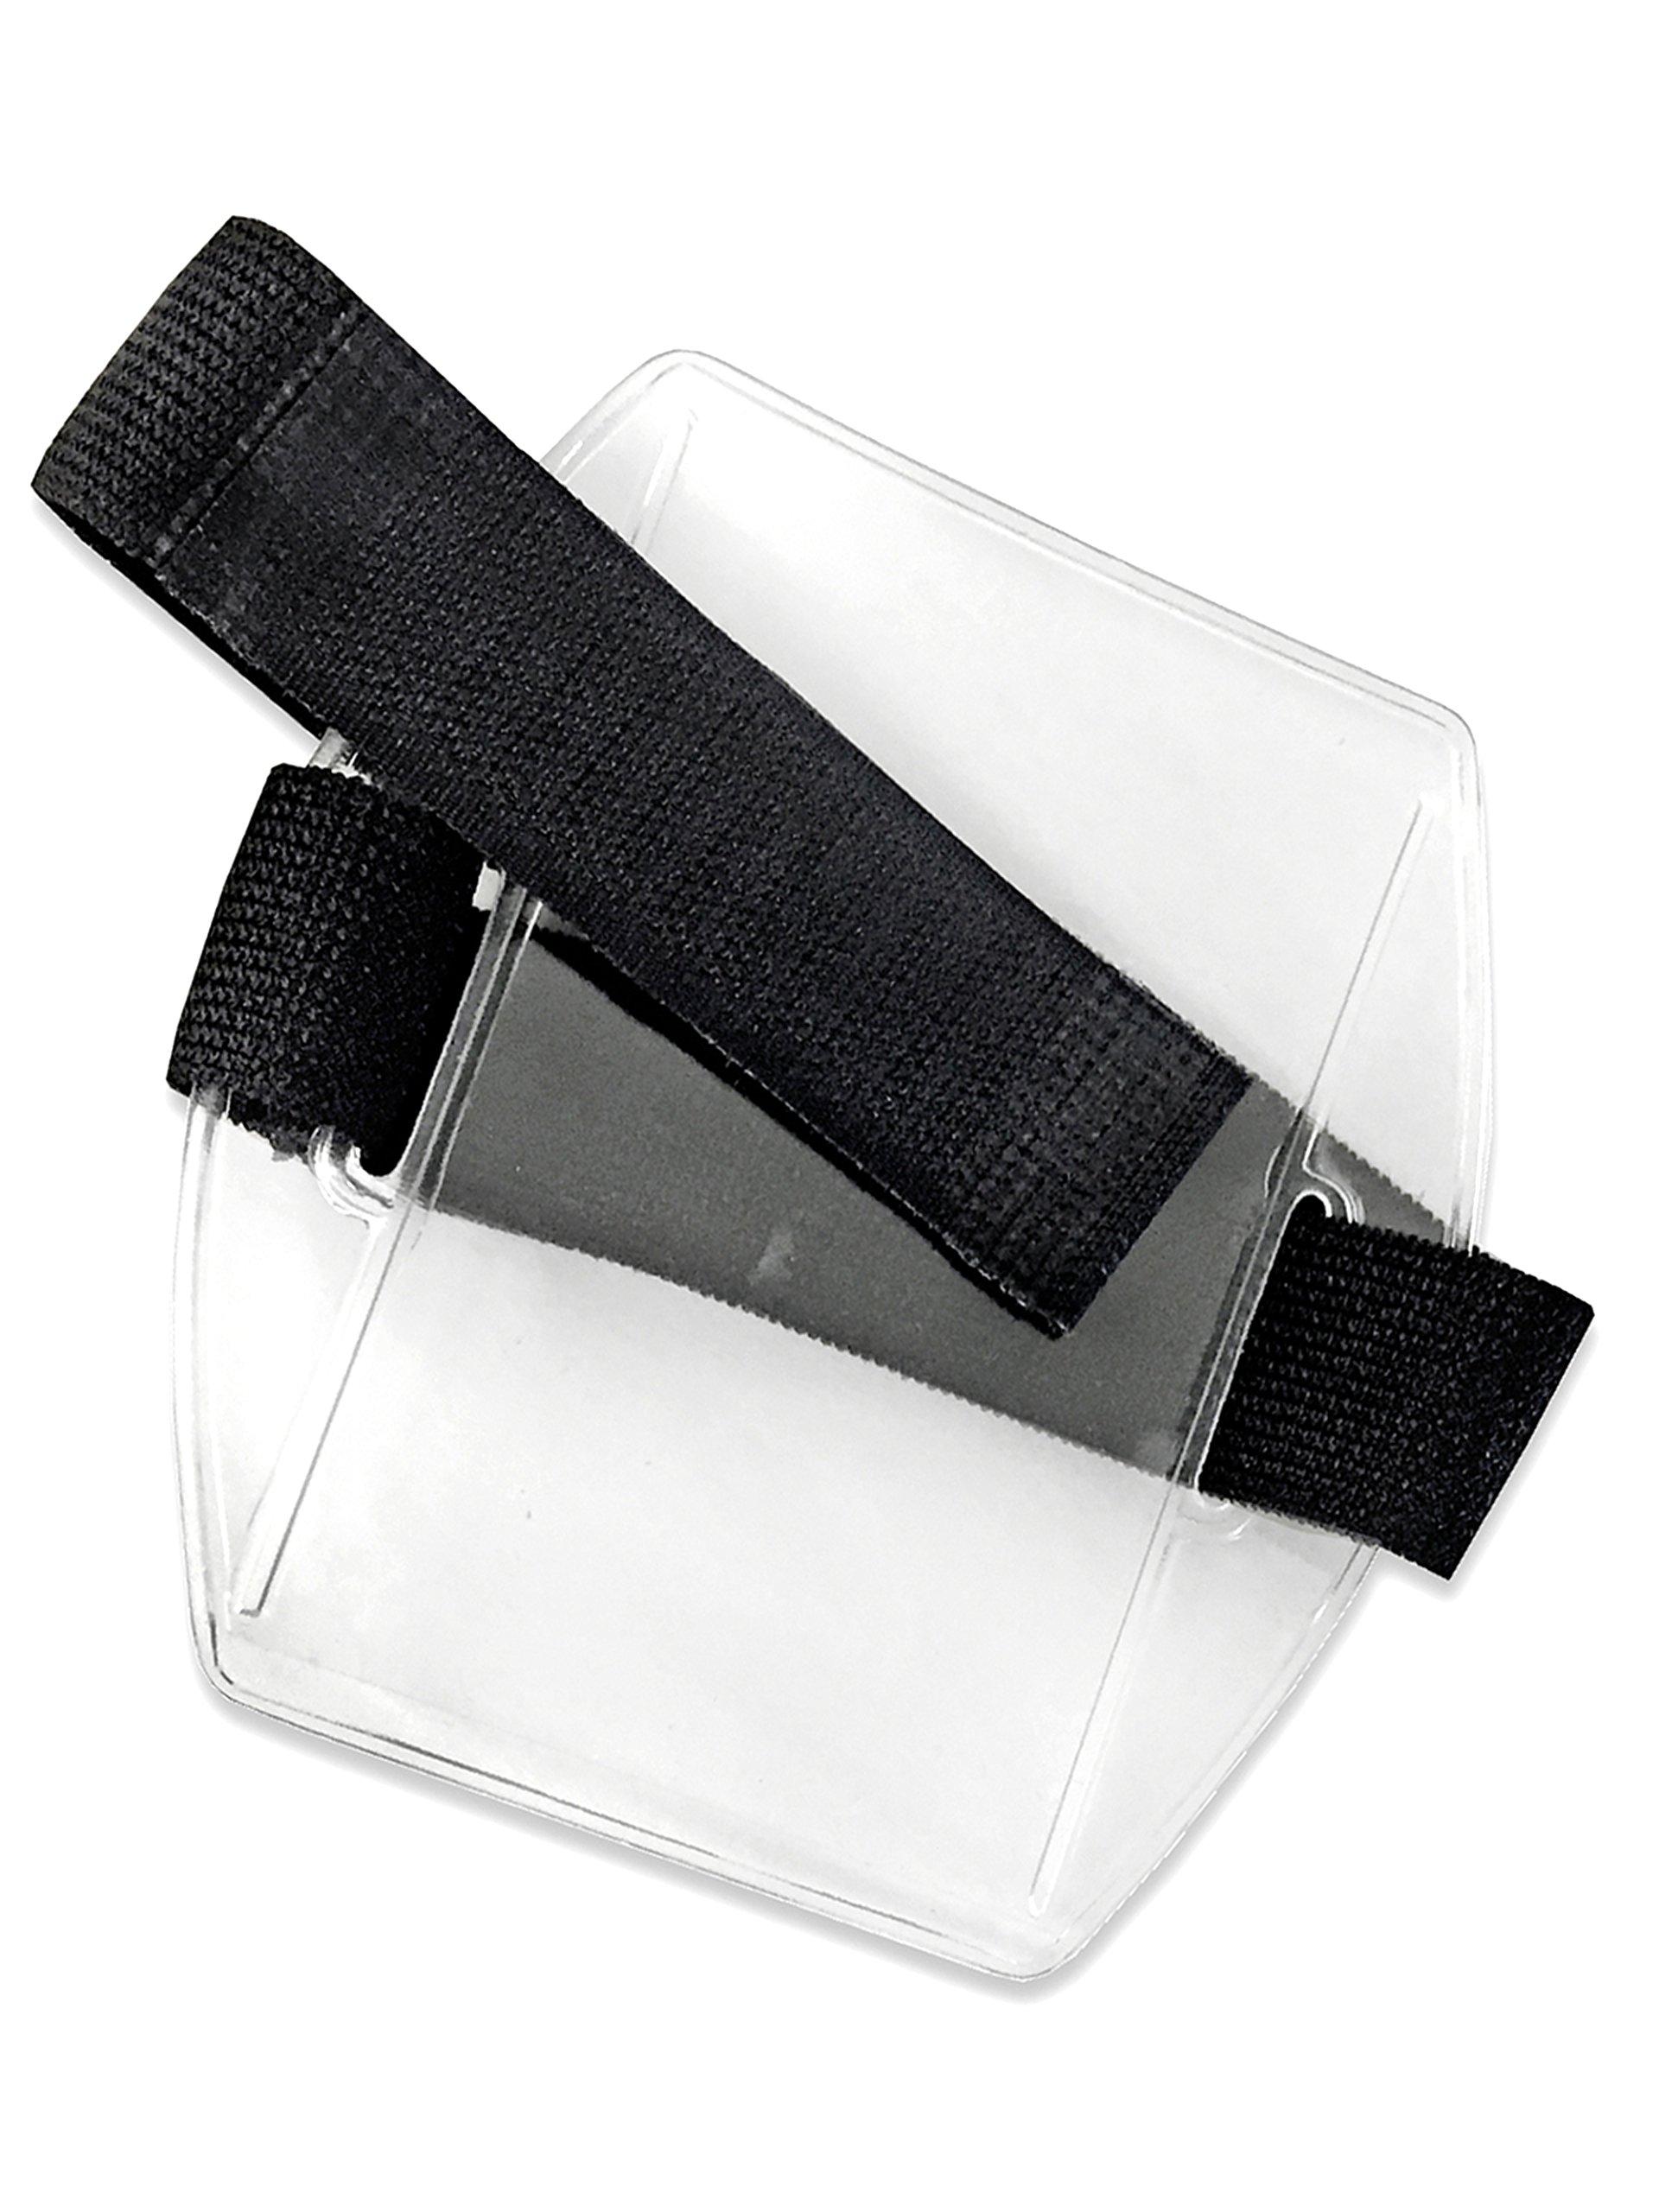 black arm band signifies - HD1920×2560